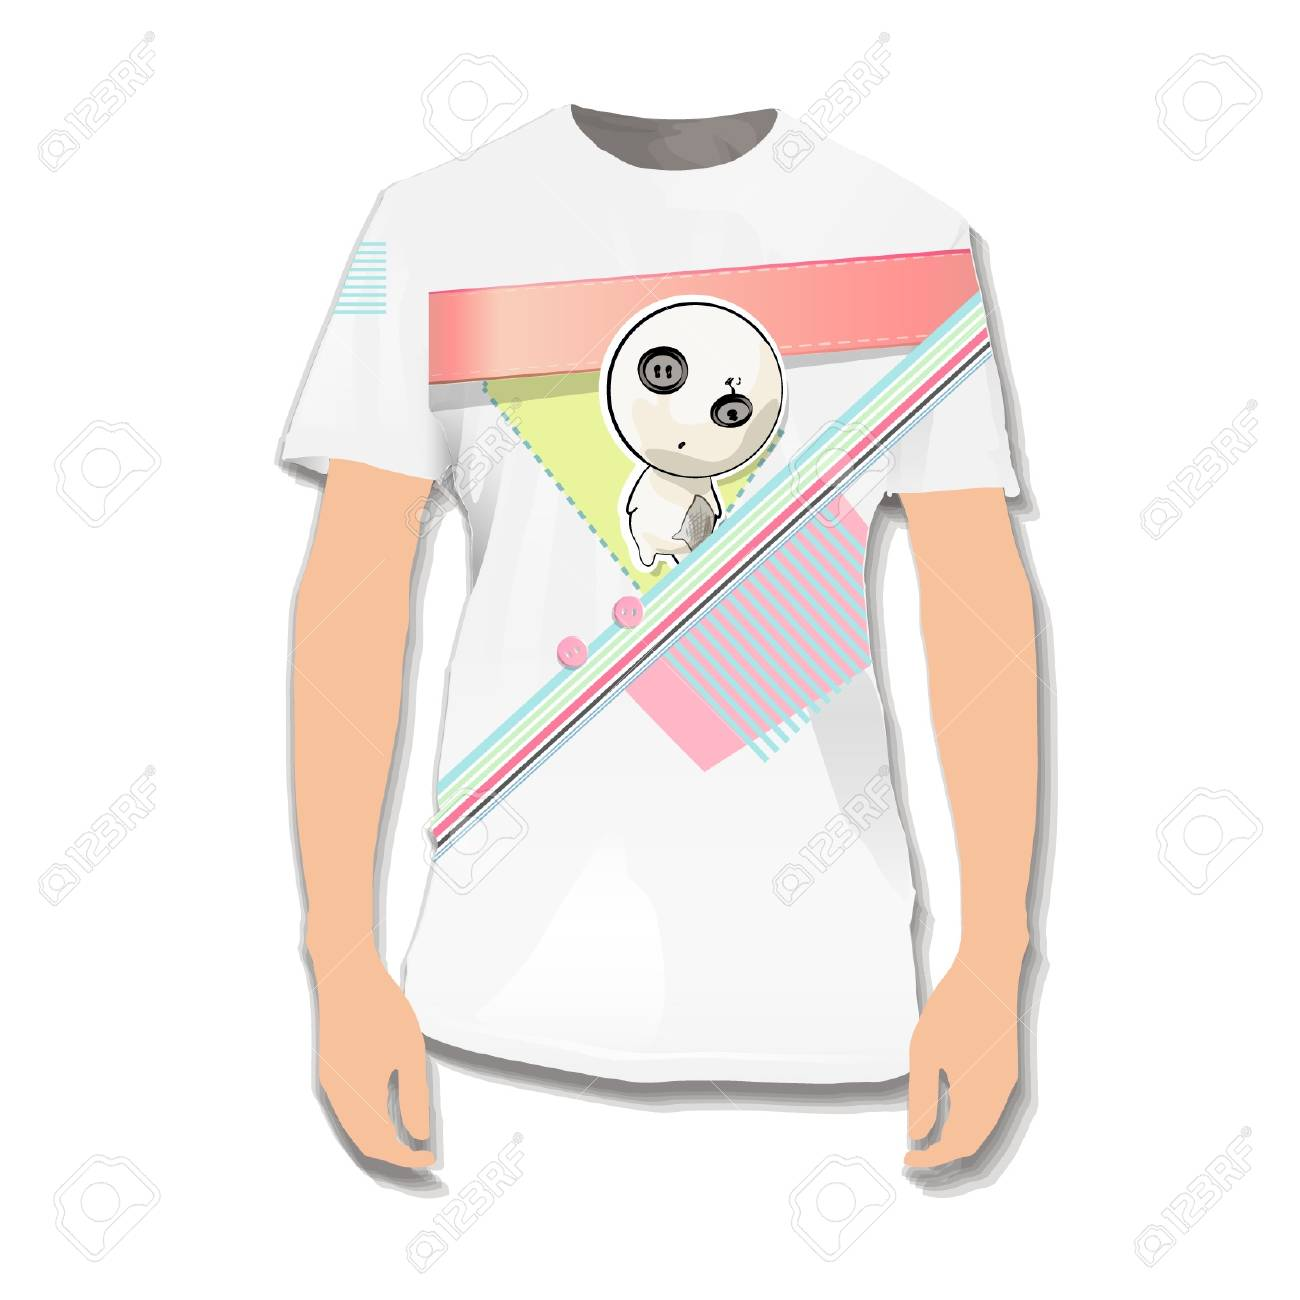 Teddy printed on shirt   design Stock Vector - 17344701